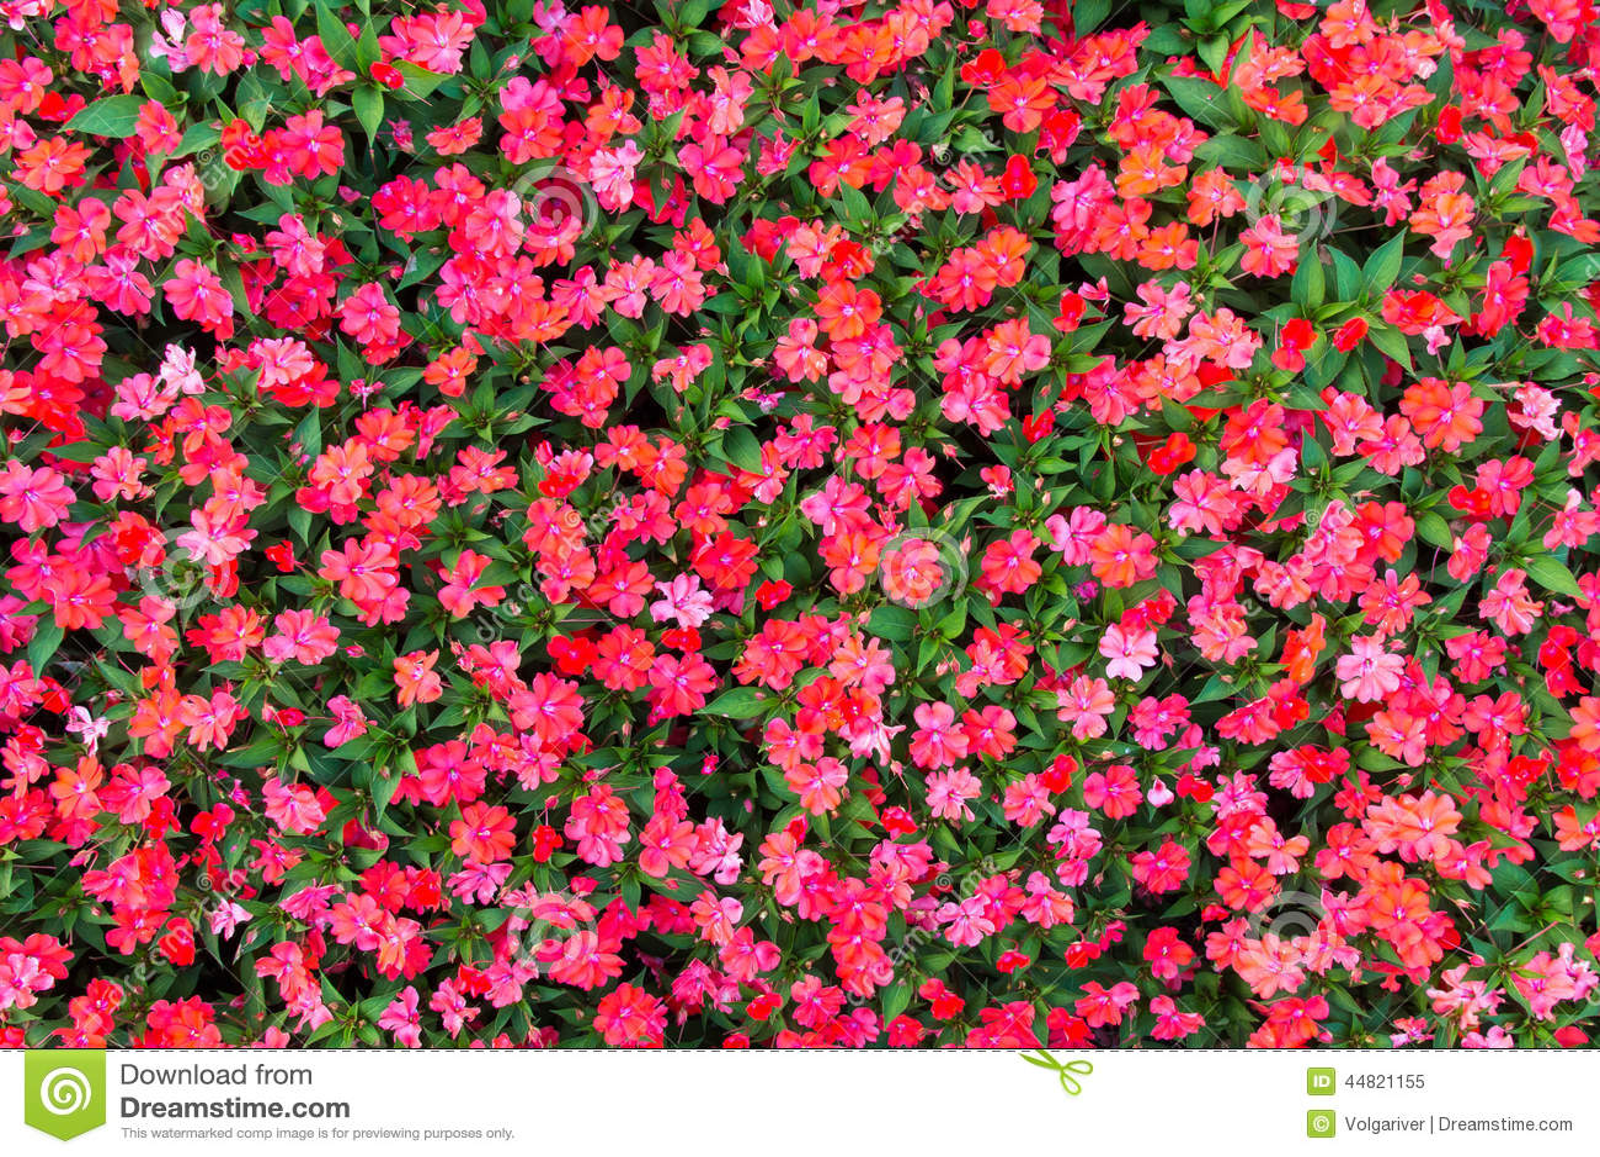 Impatiens Flowers Background Stock Photo Image 44821155